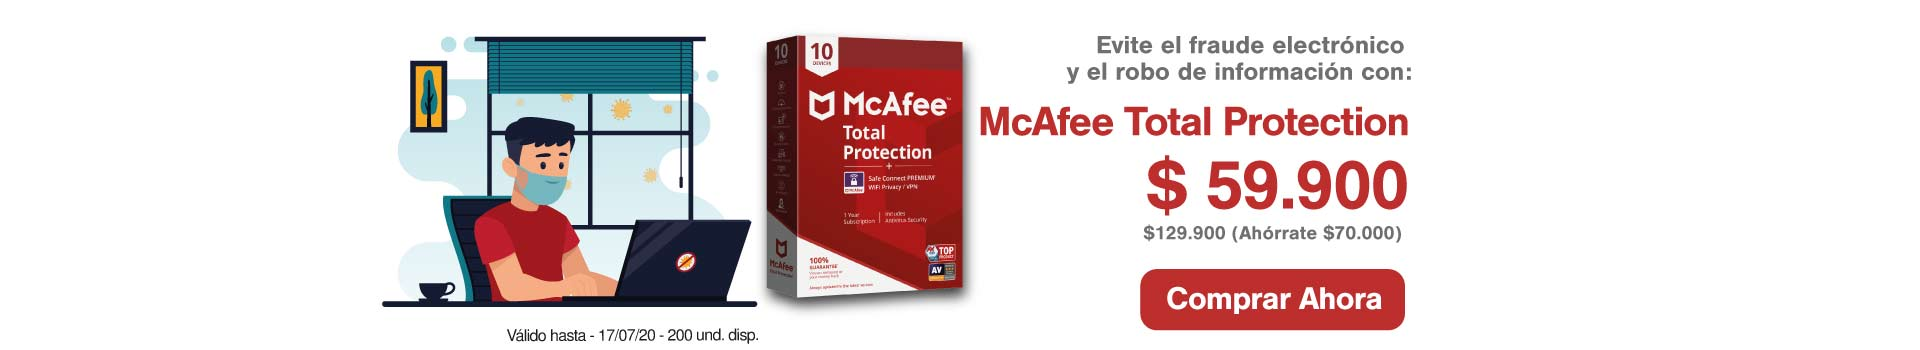 AK-ACCESORIOS-BCAT4-MCFEE-ANTIVIRUS-11JULIO2020